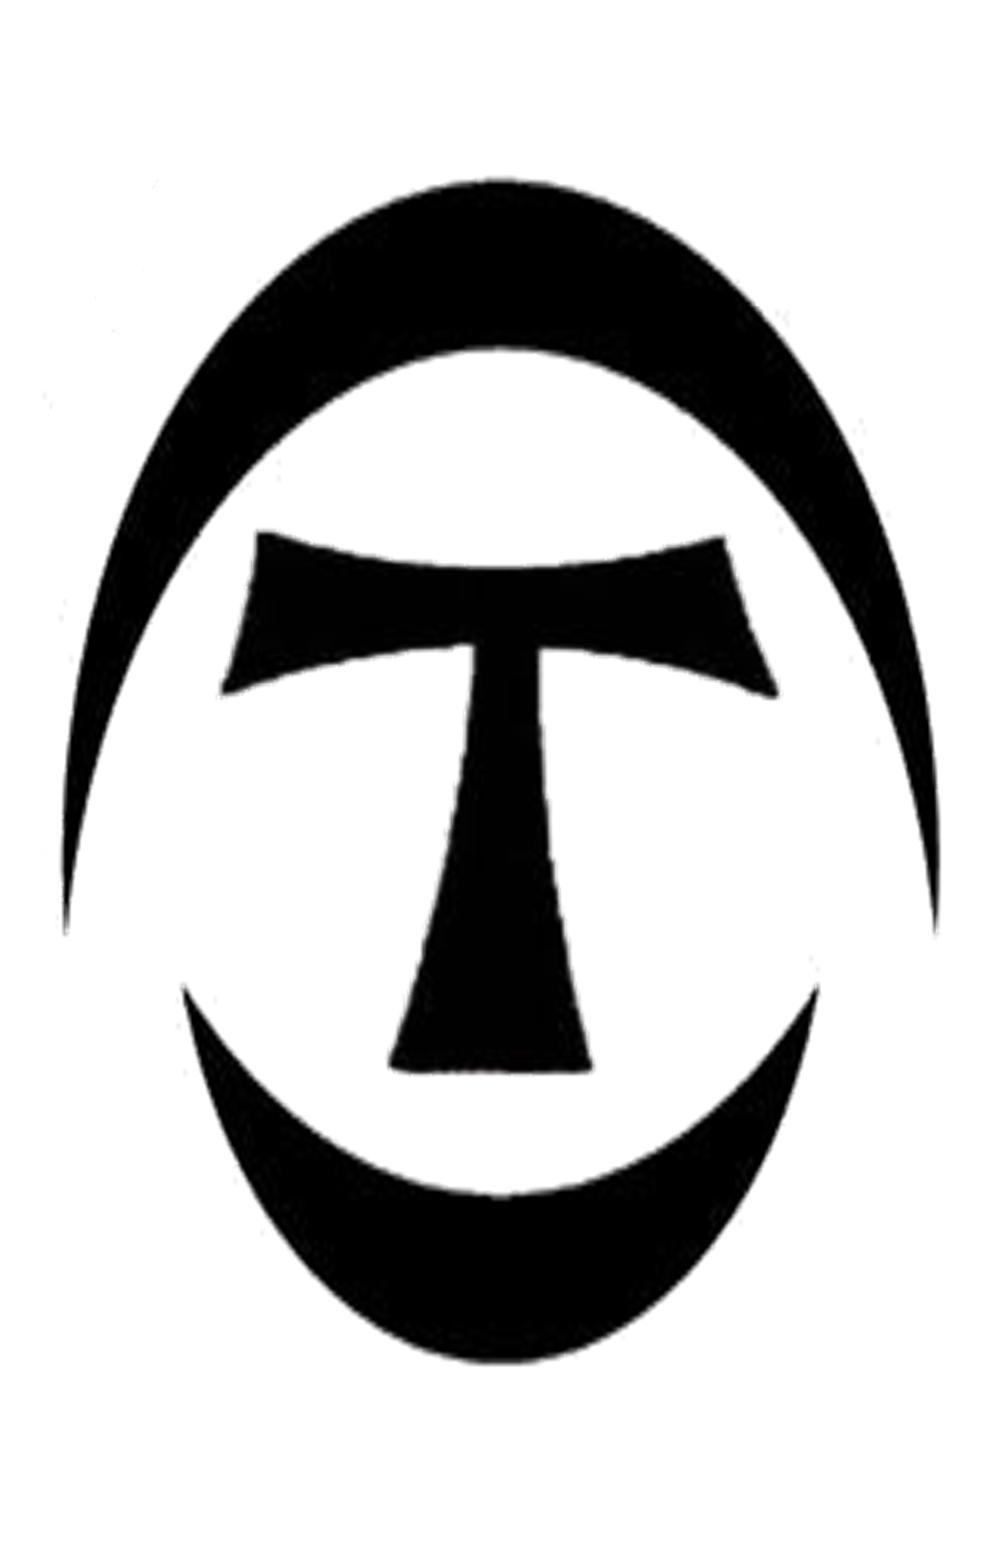 theunitarianchristian.org